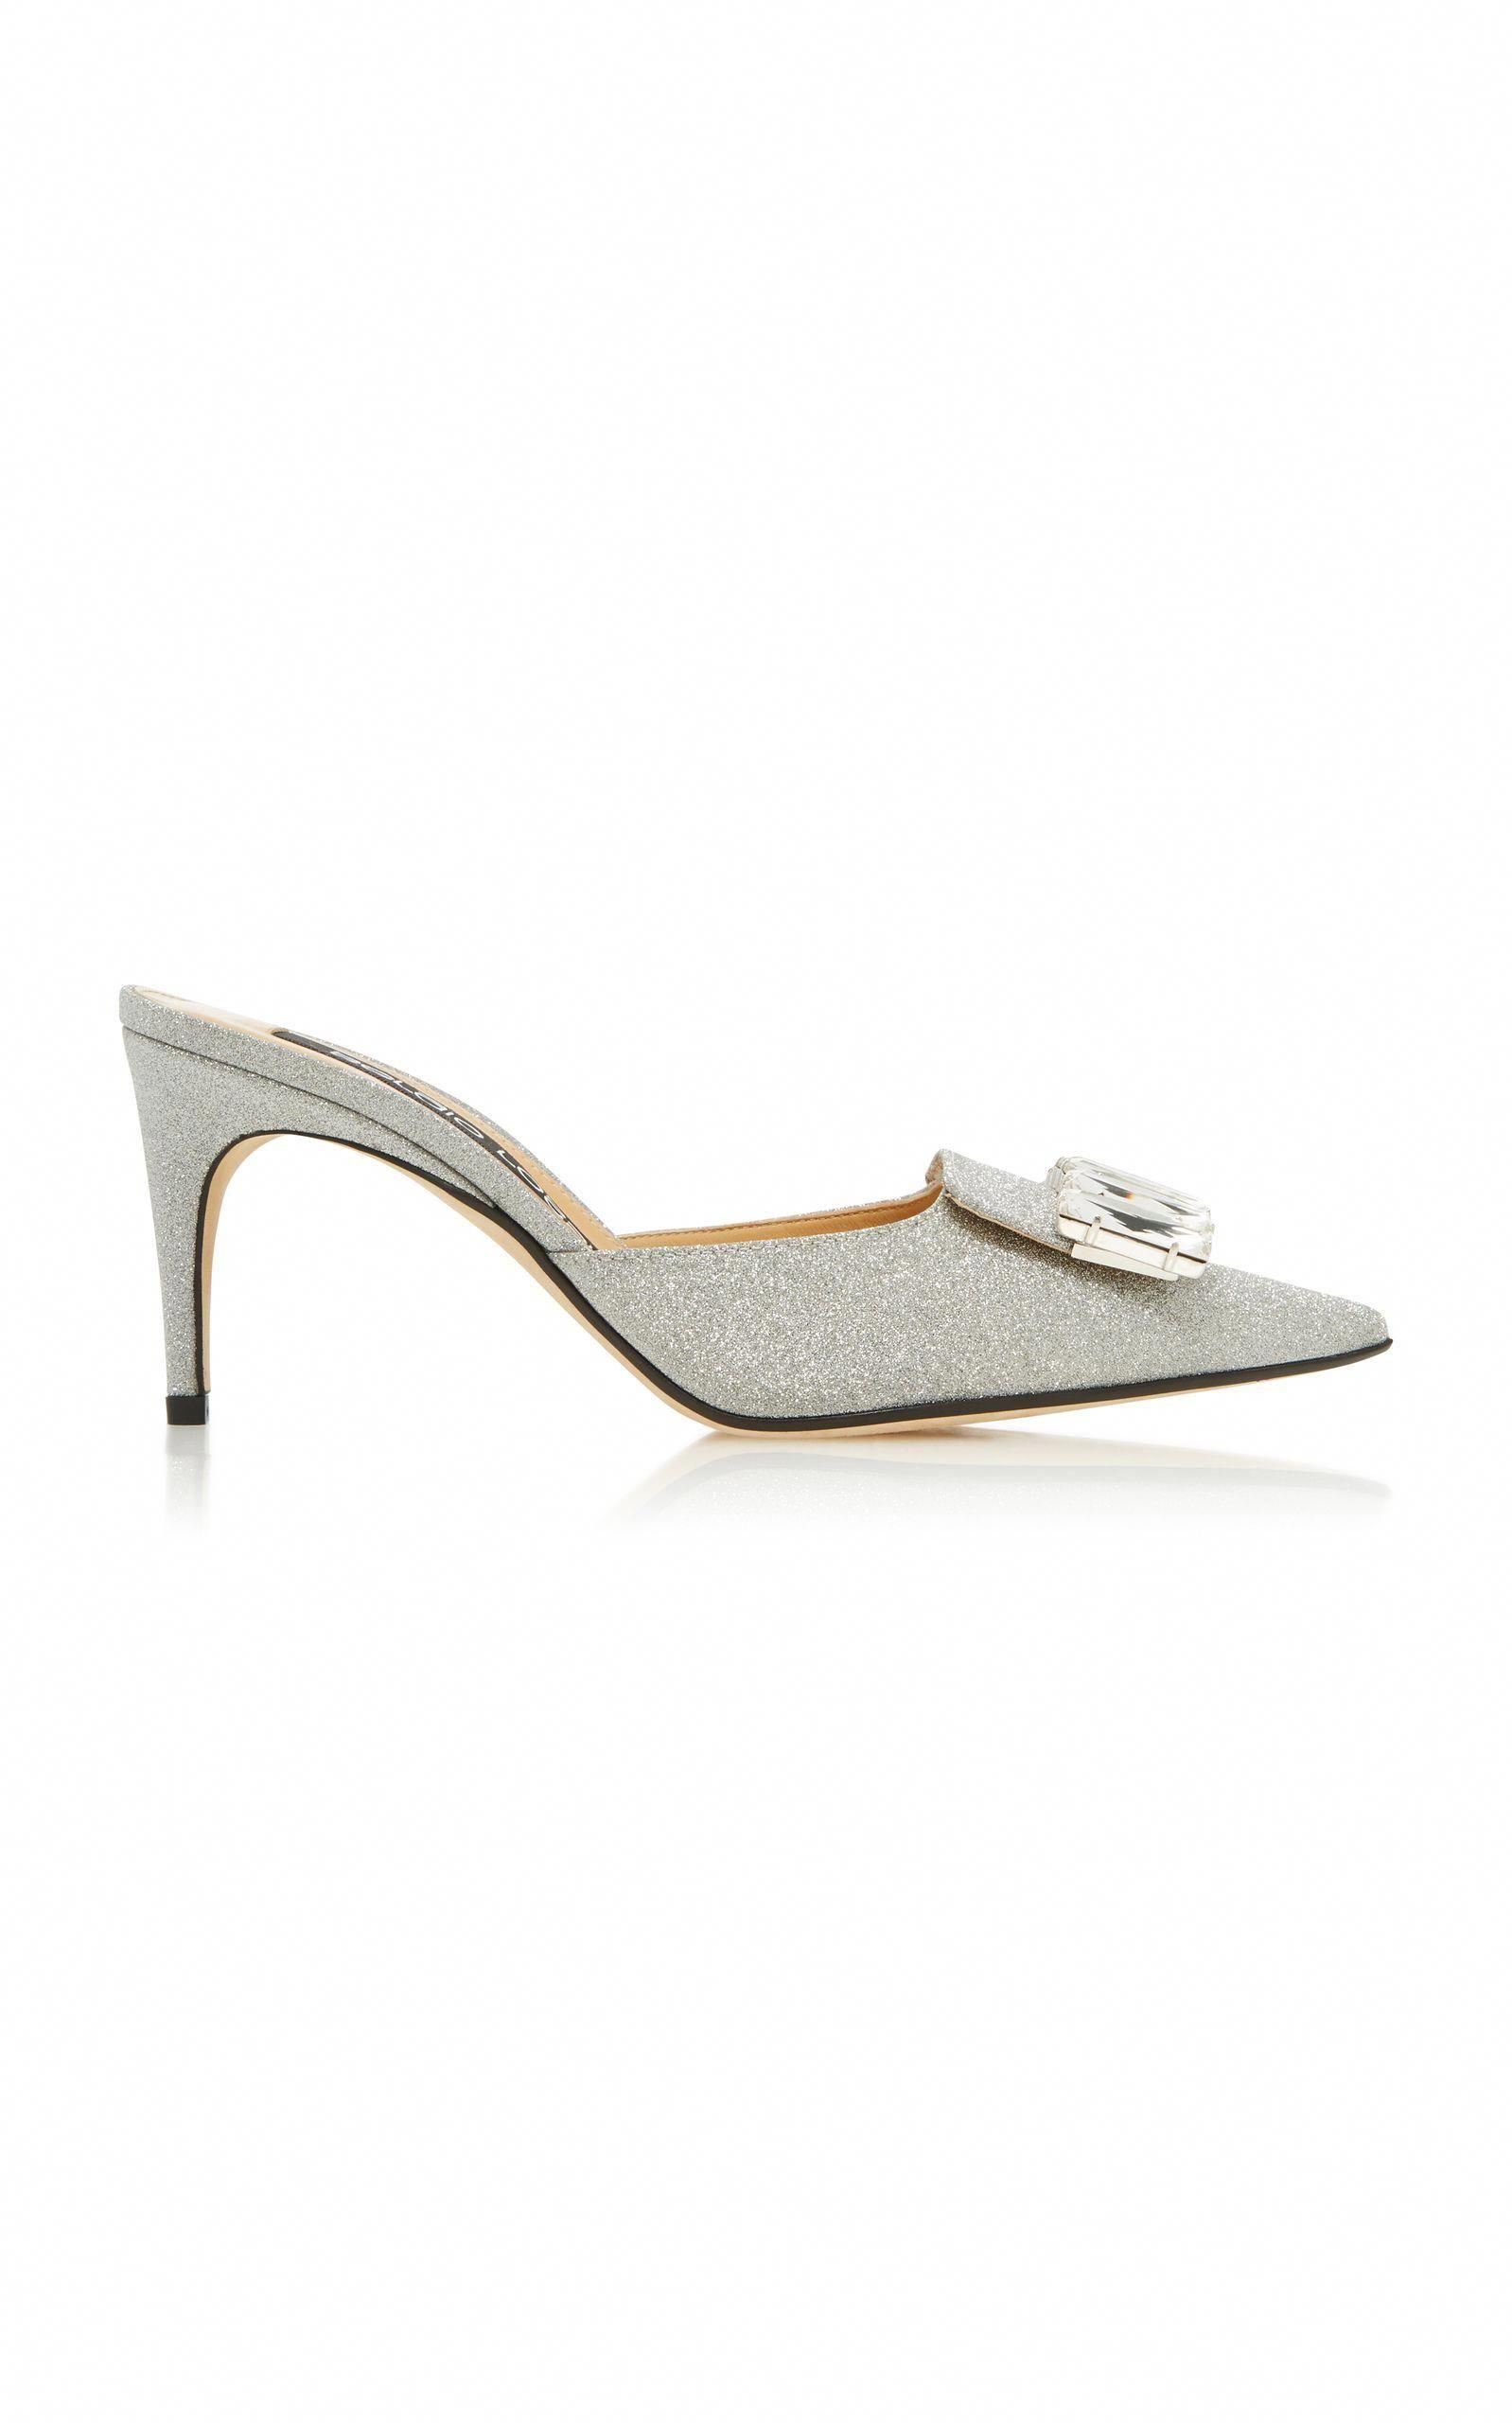 972c747cf7a SERGIO ROSSI SR1 MULE.  sergiorossi  shoes